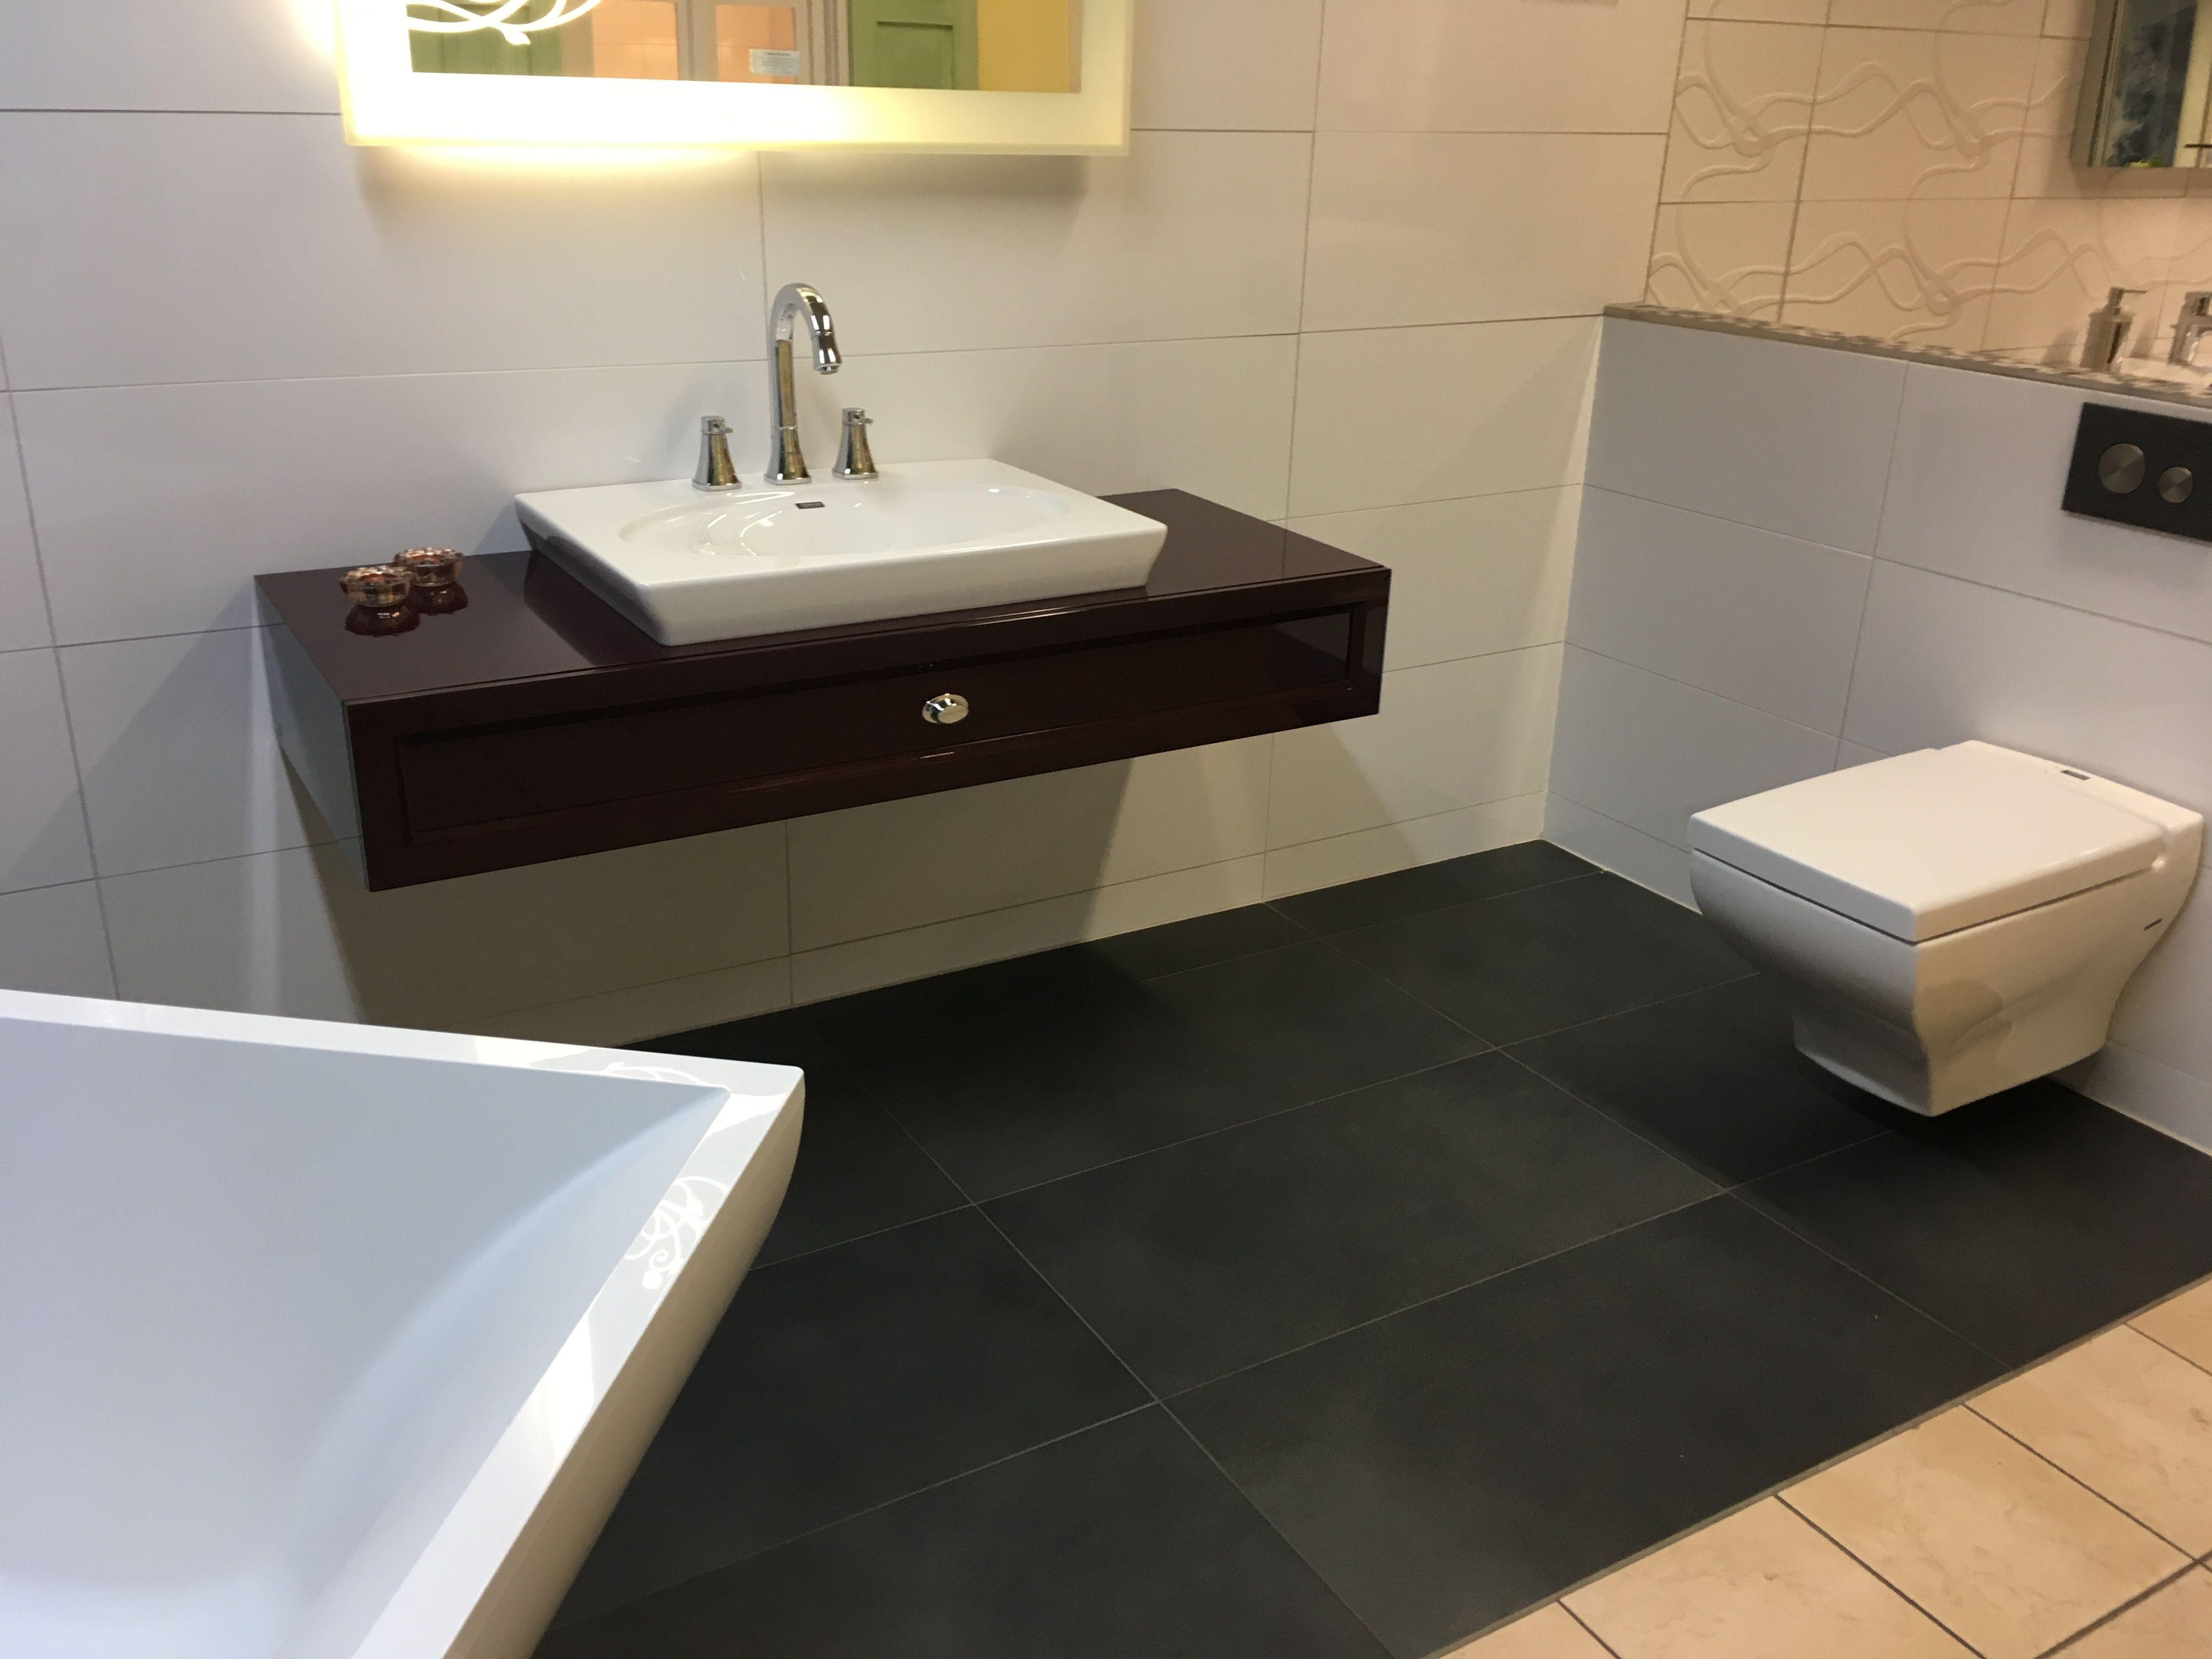 Mülleimer Badezimmer ~ 111 best bad images on pinterest bath design bathroom and